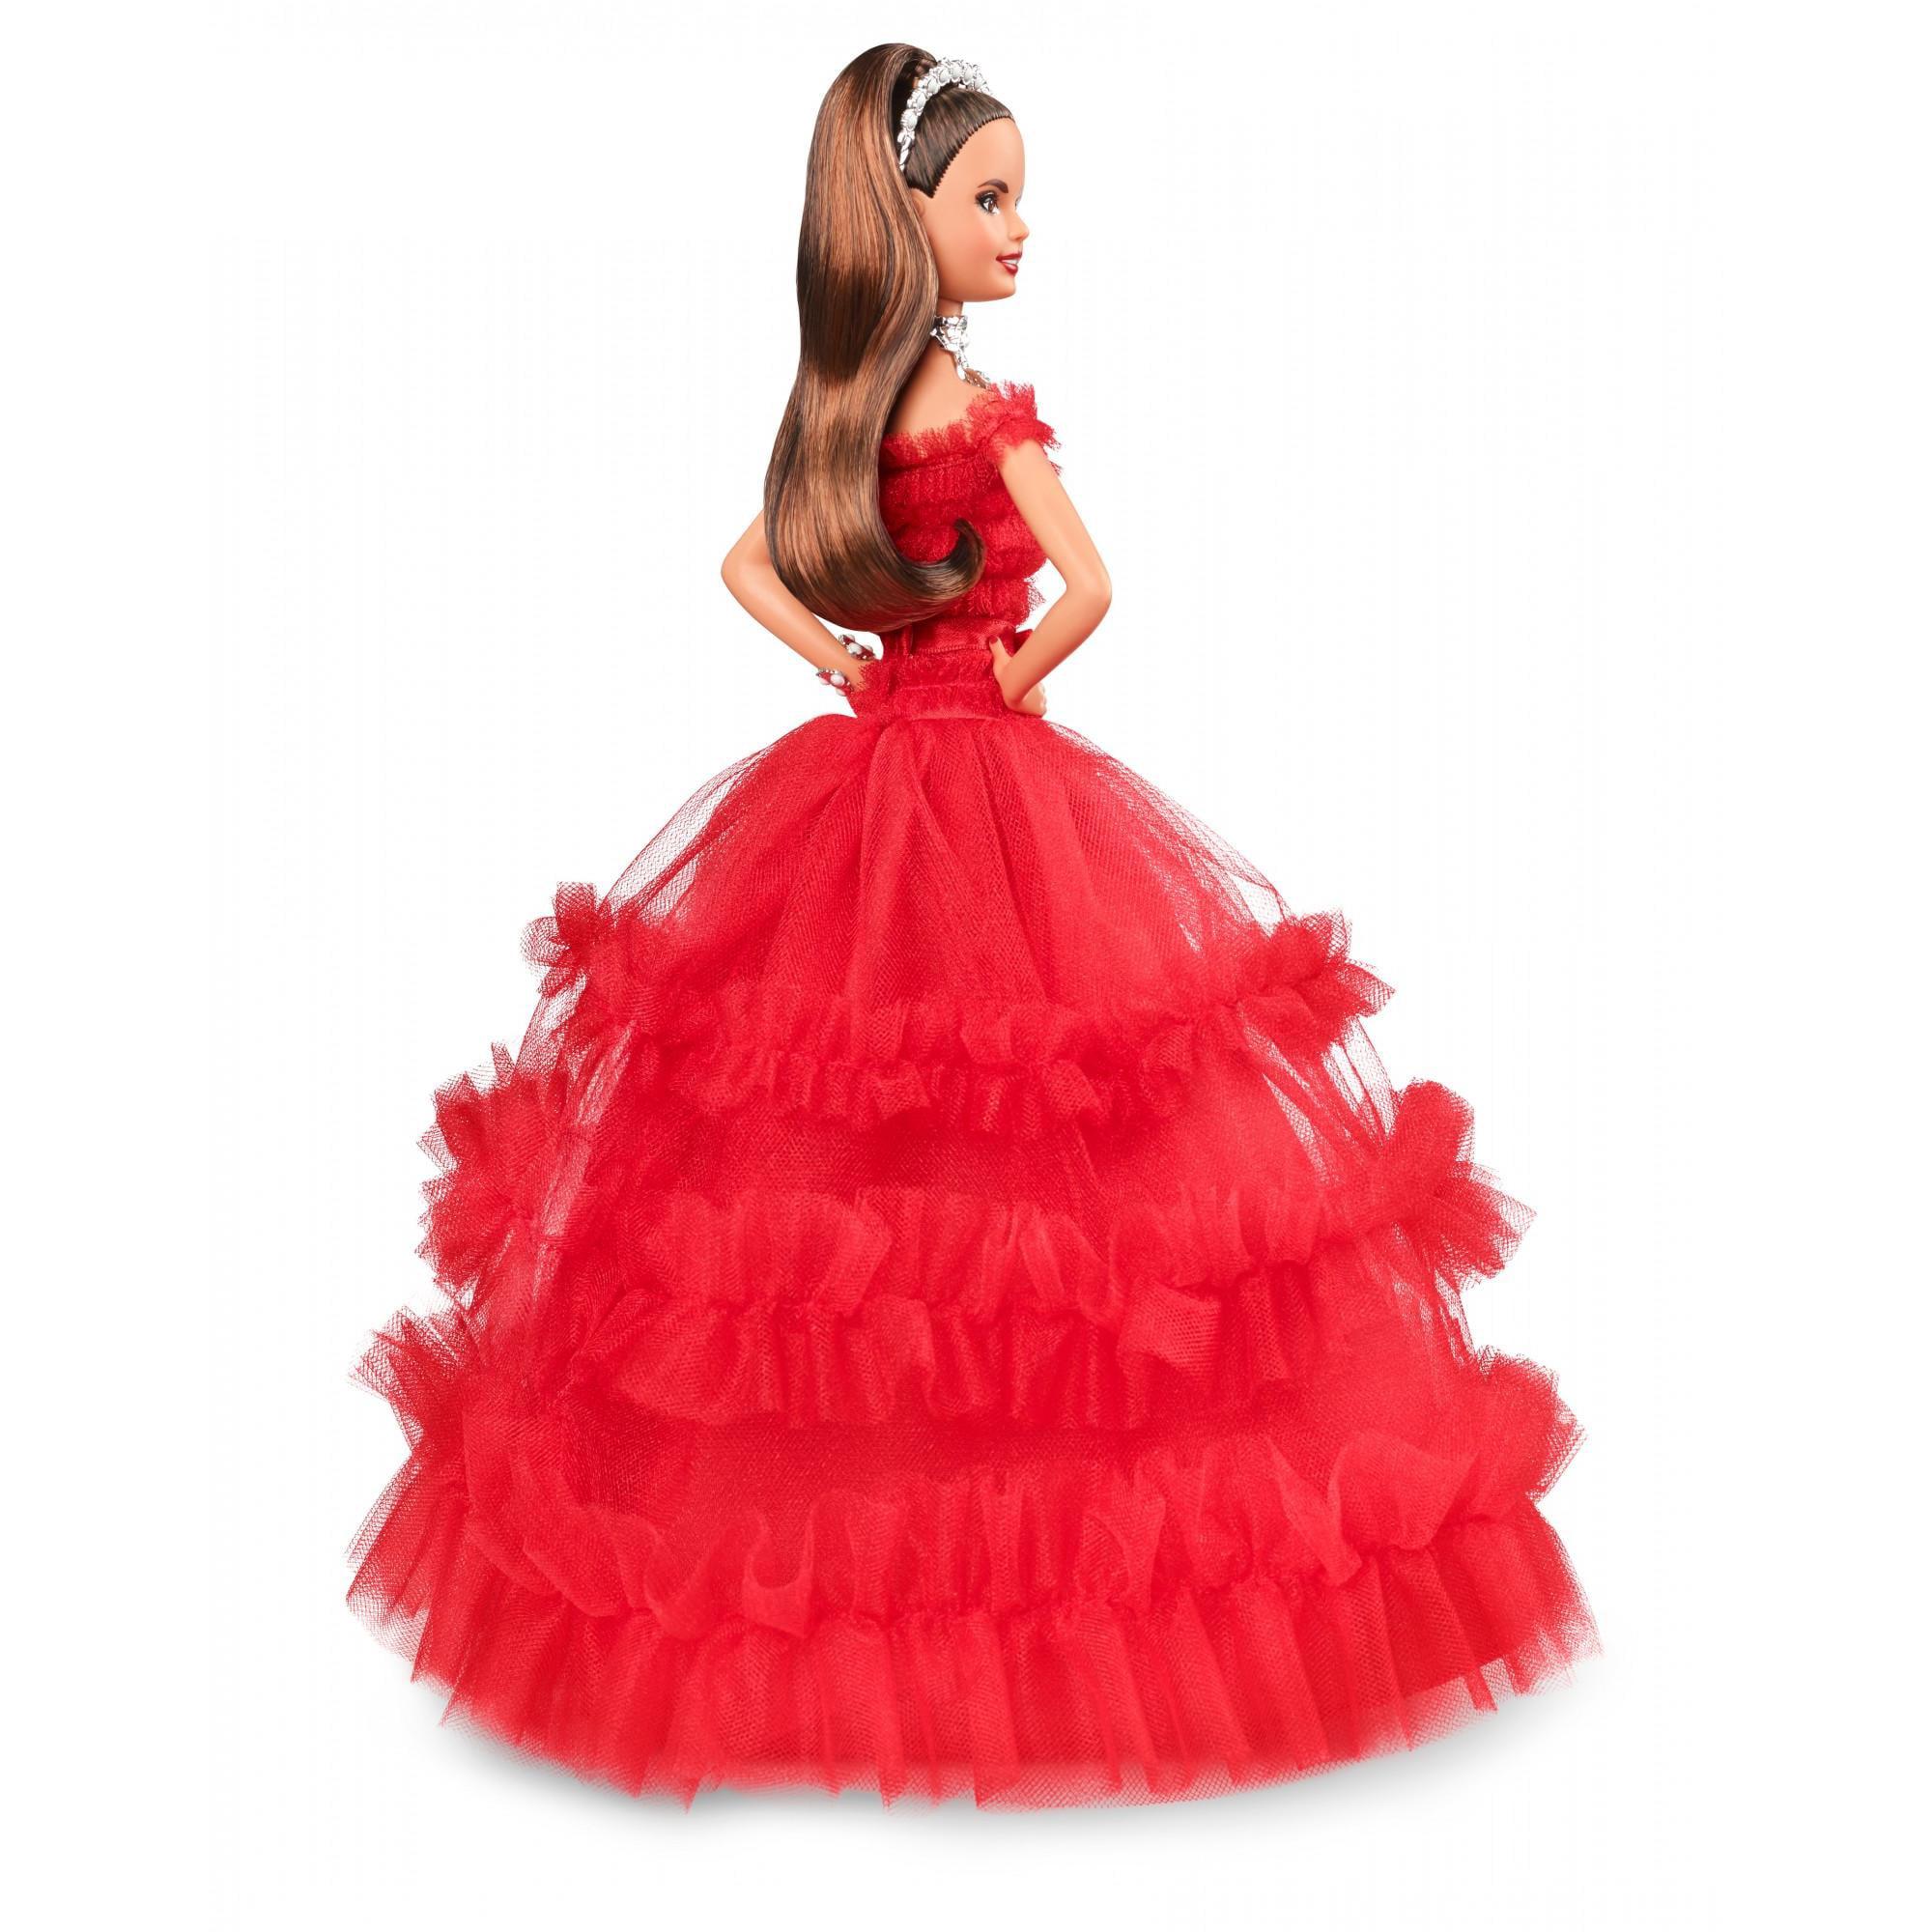 Brunette 2017 Best Girls CHRISTMAS Gift HOLIDAY BARBIE Collector Teresa Doll